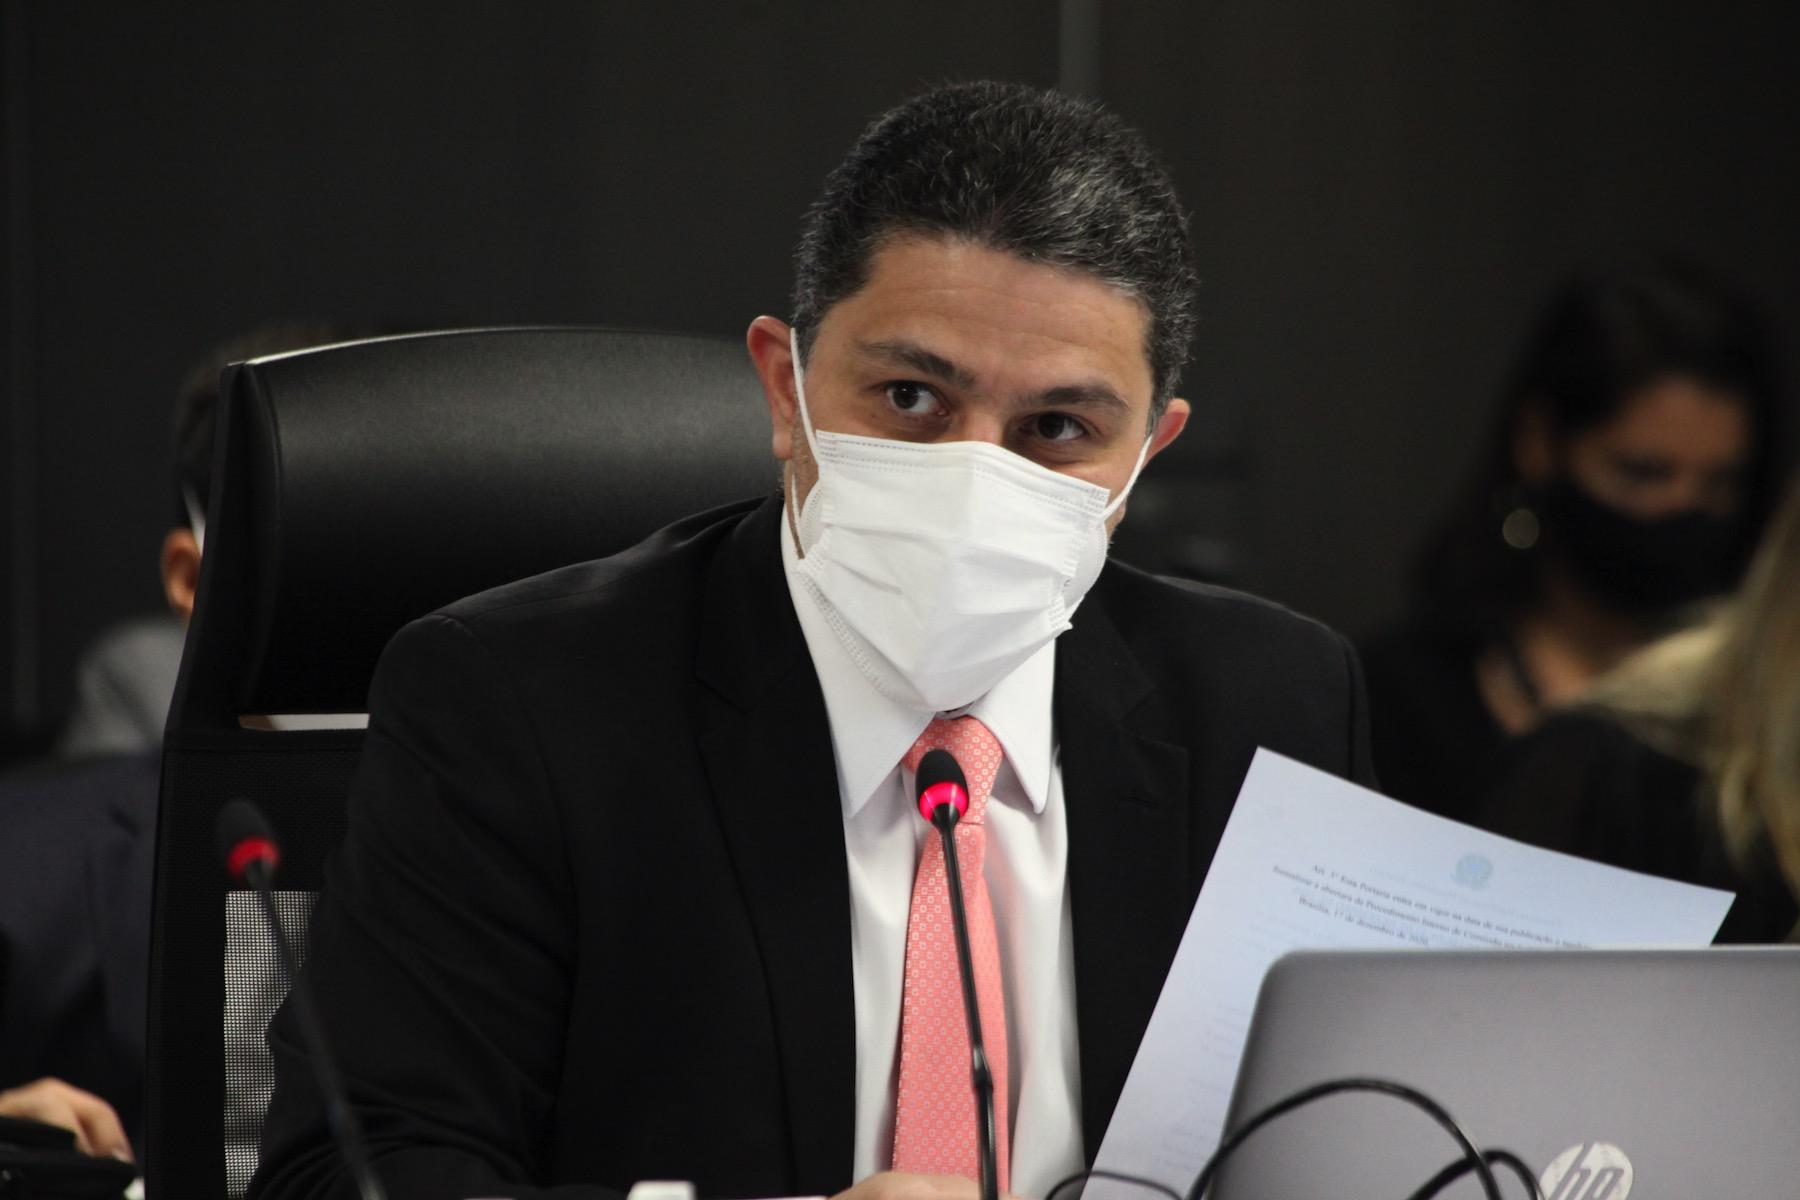 Conselheiro Silvio Amorim